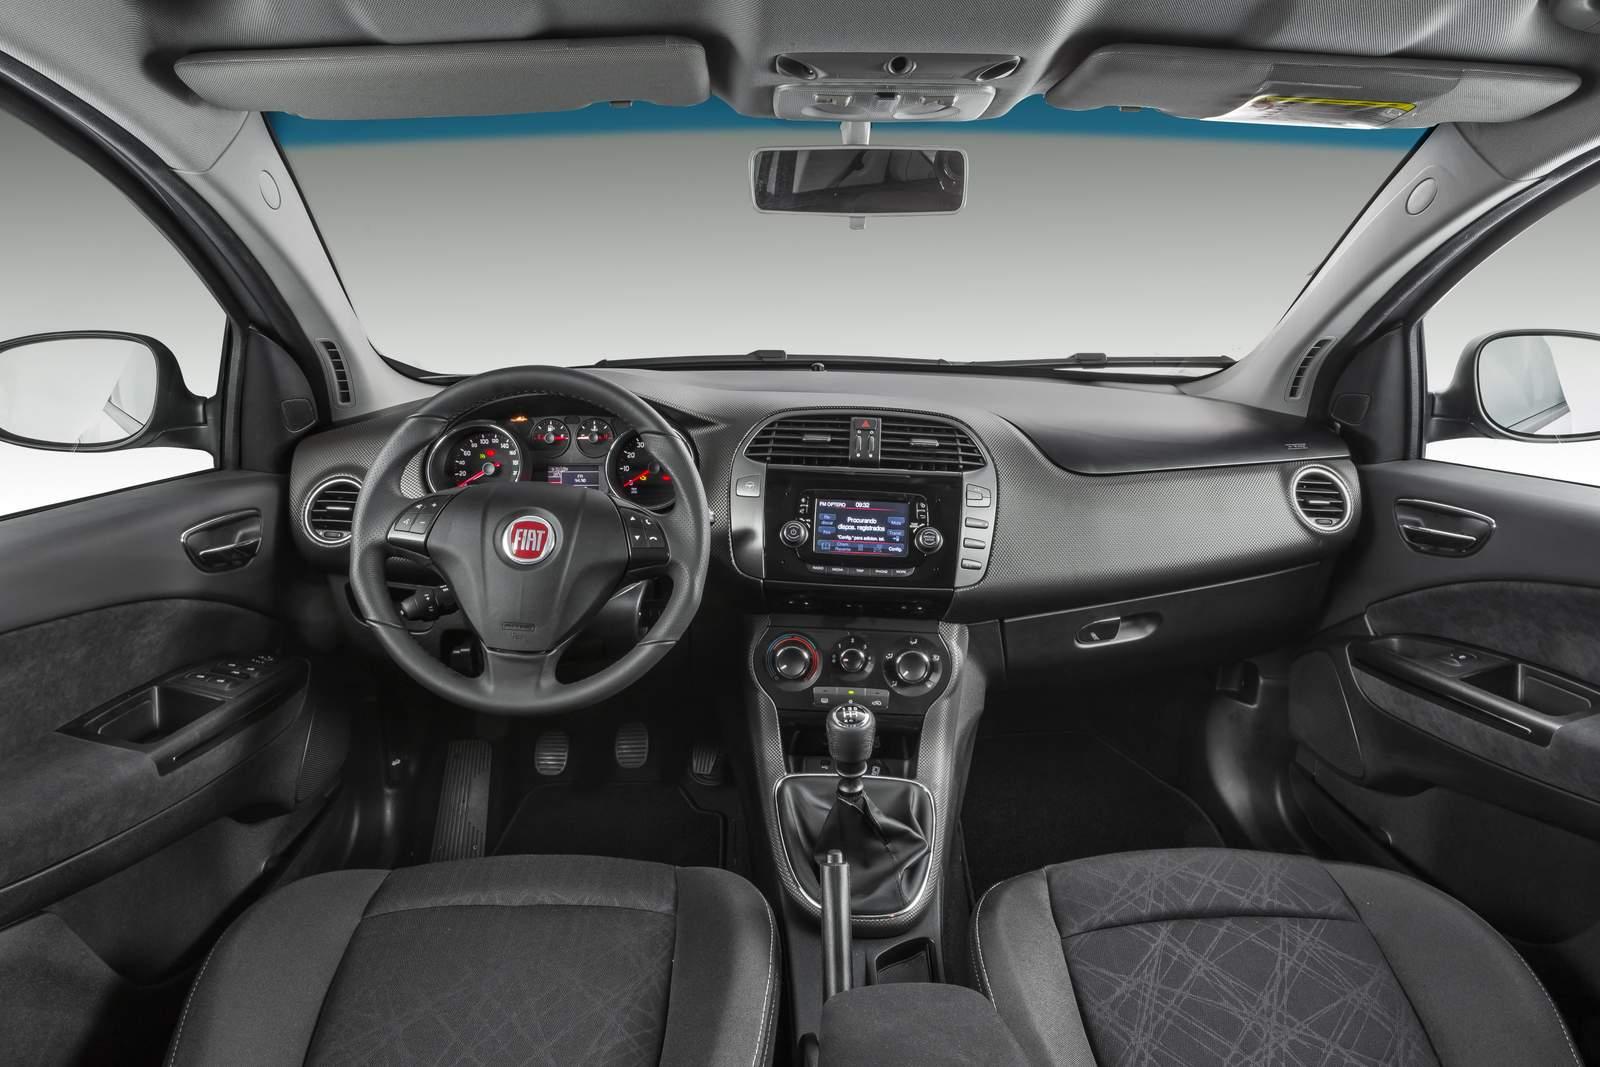 Fiat Bravo 2016 Essence - interior